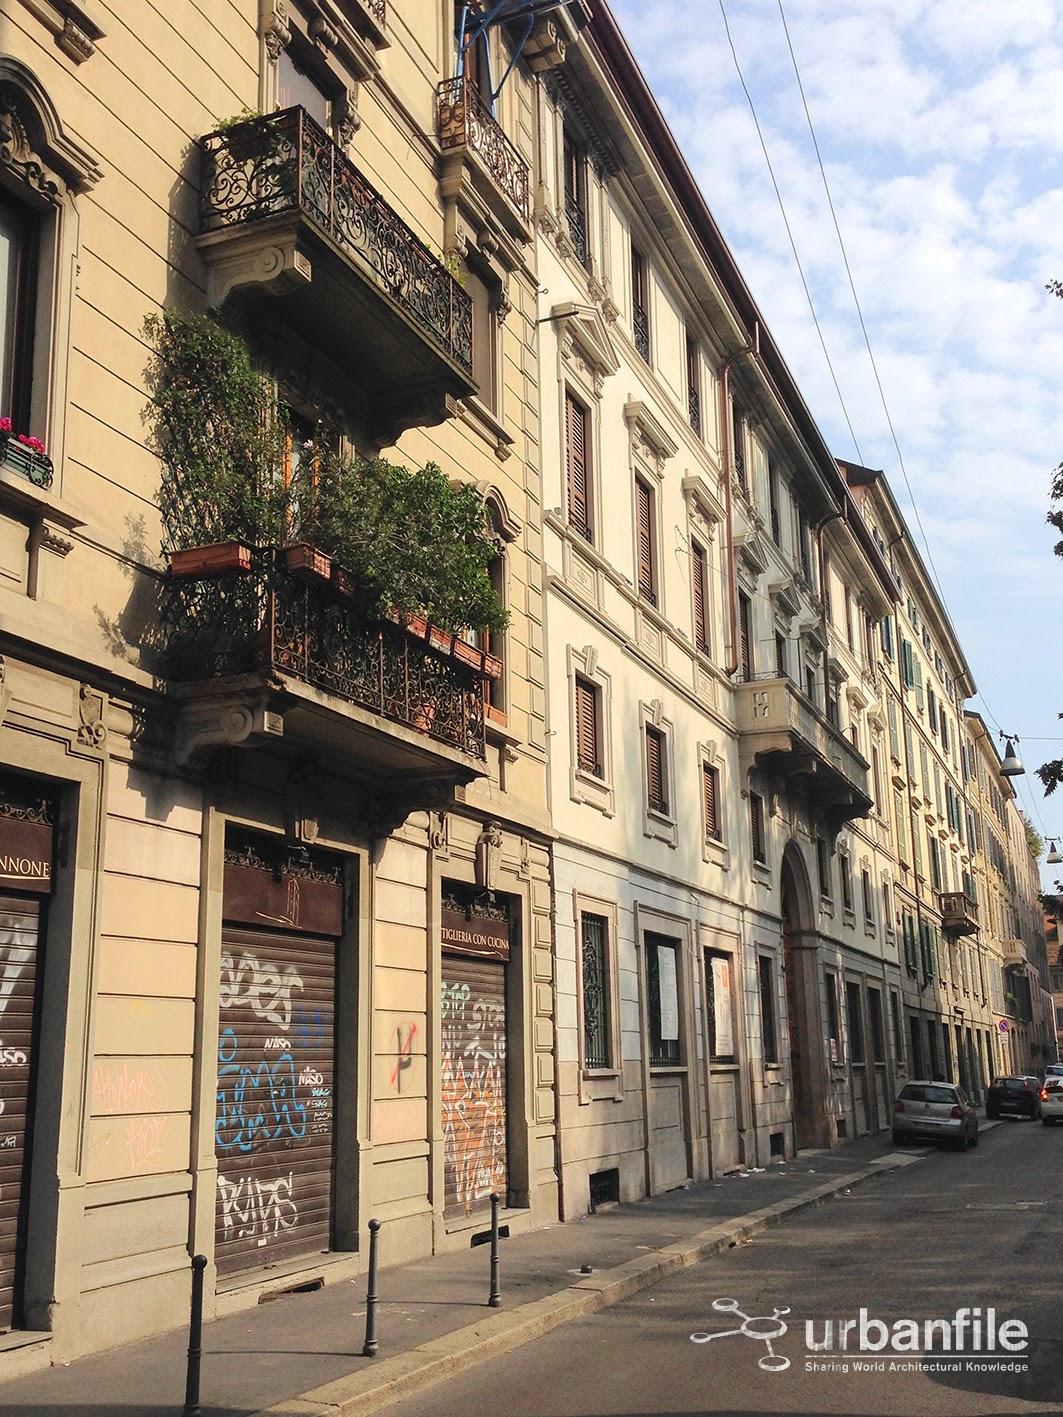 Milano borgo degli ortolani via pietro giannone 8 il for Via pietro mascagni 8 milano